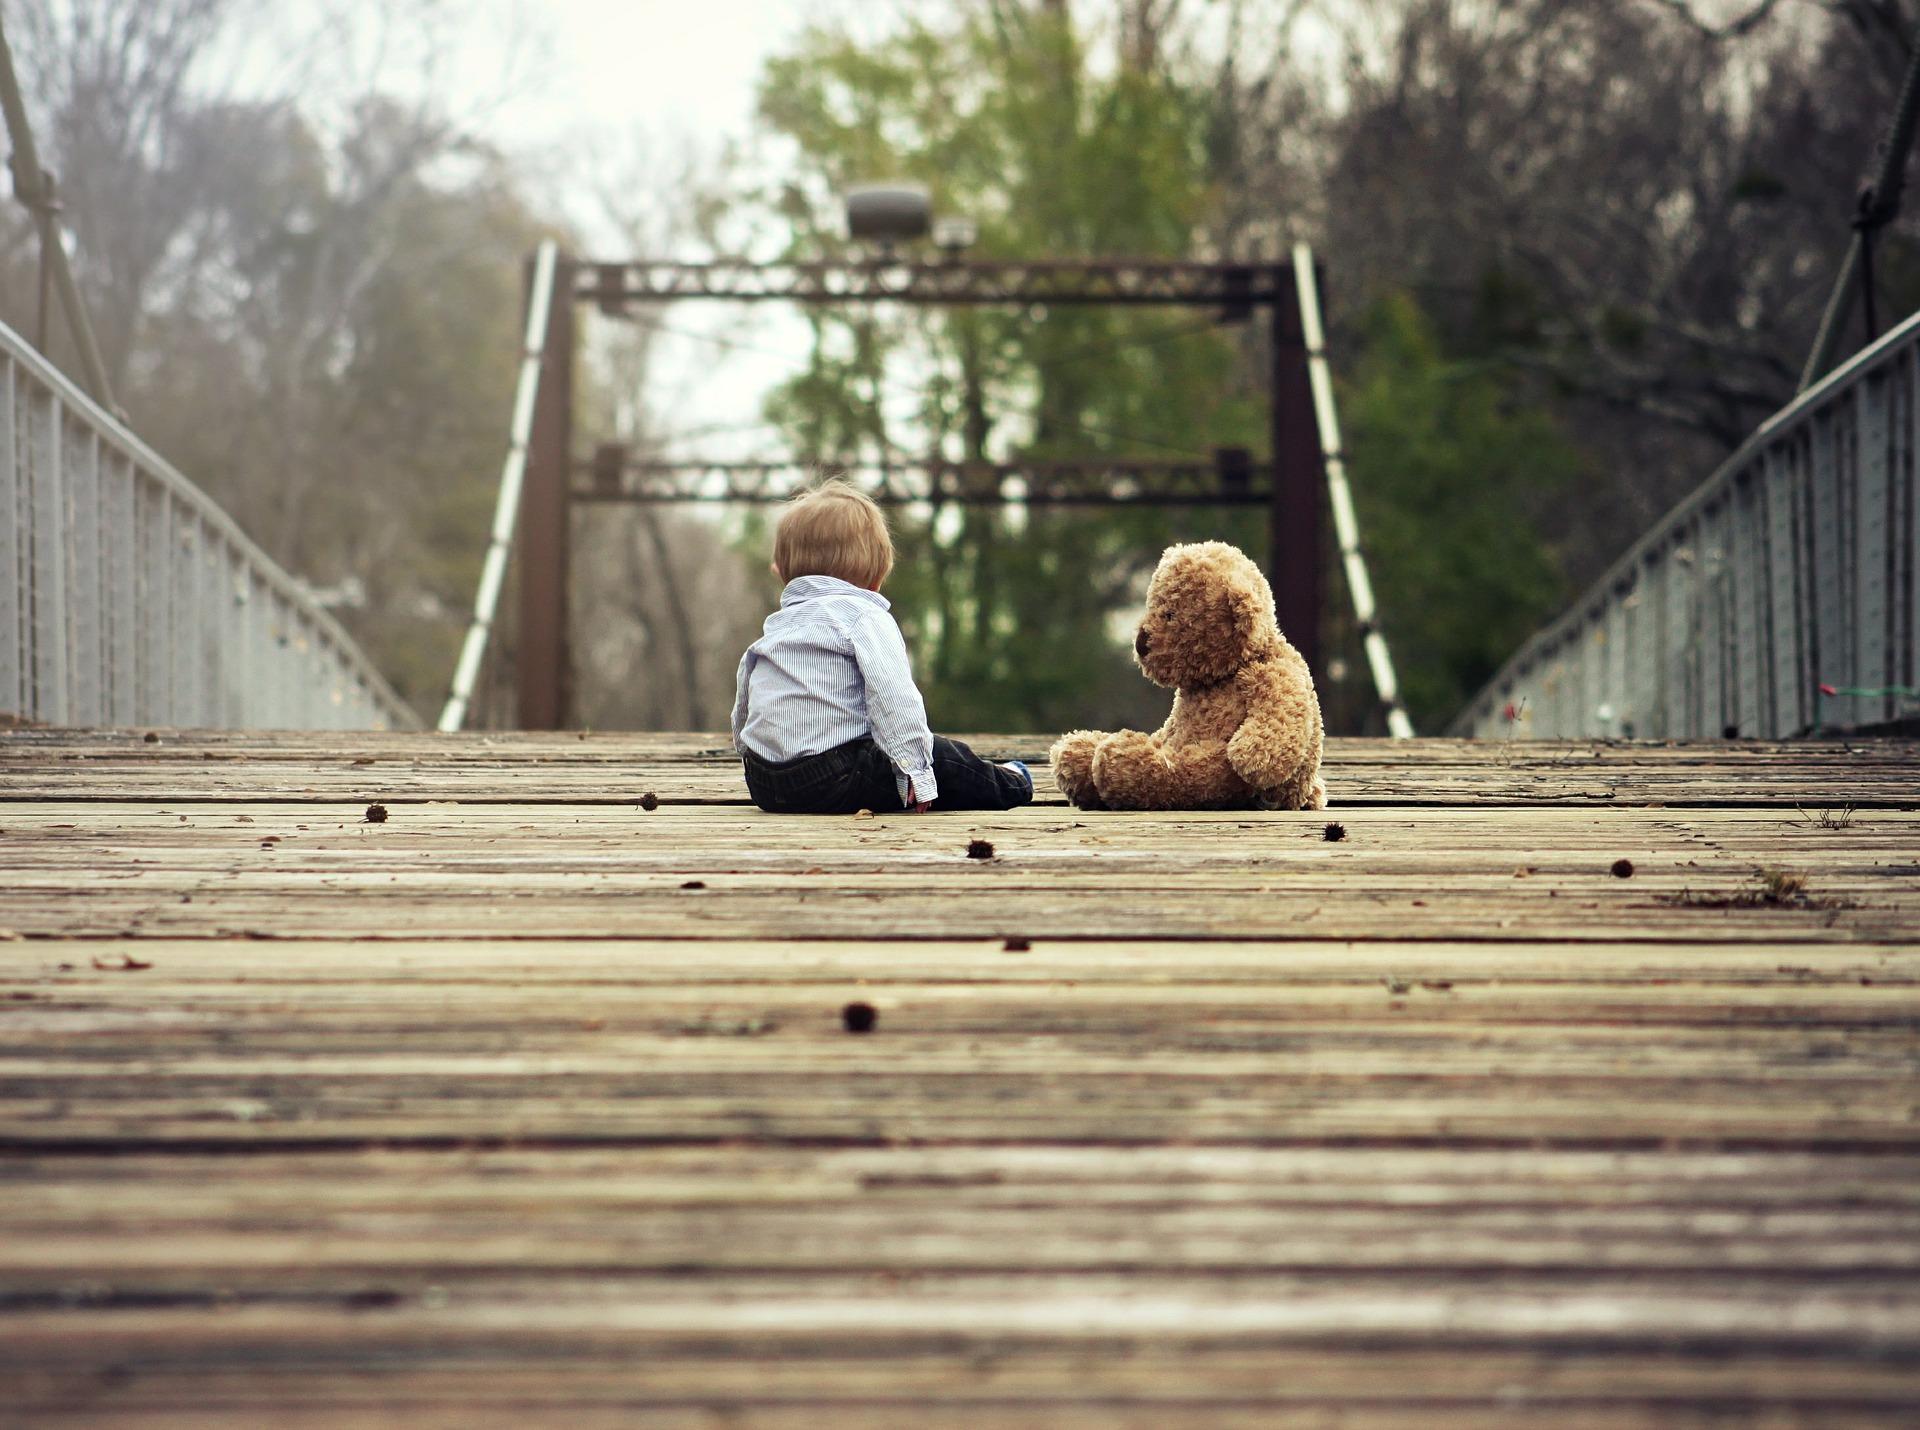 enfant nounours et pont.jpg